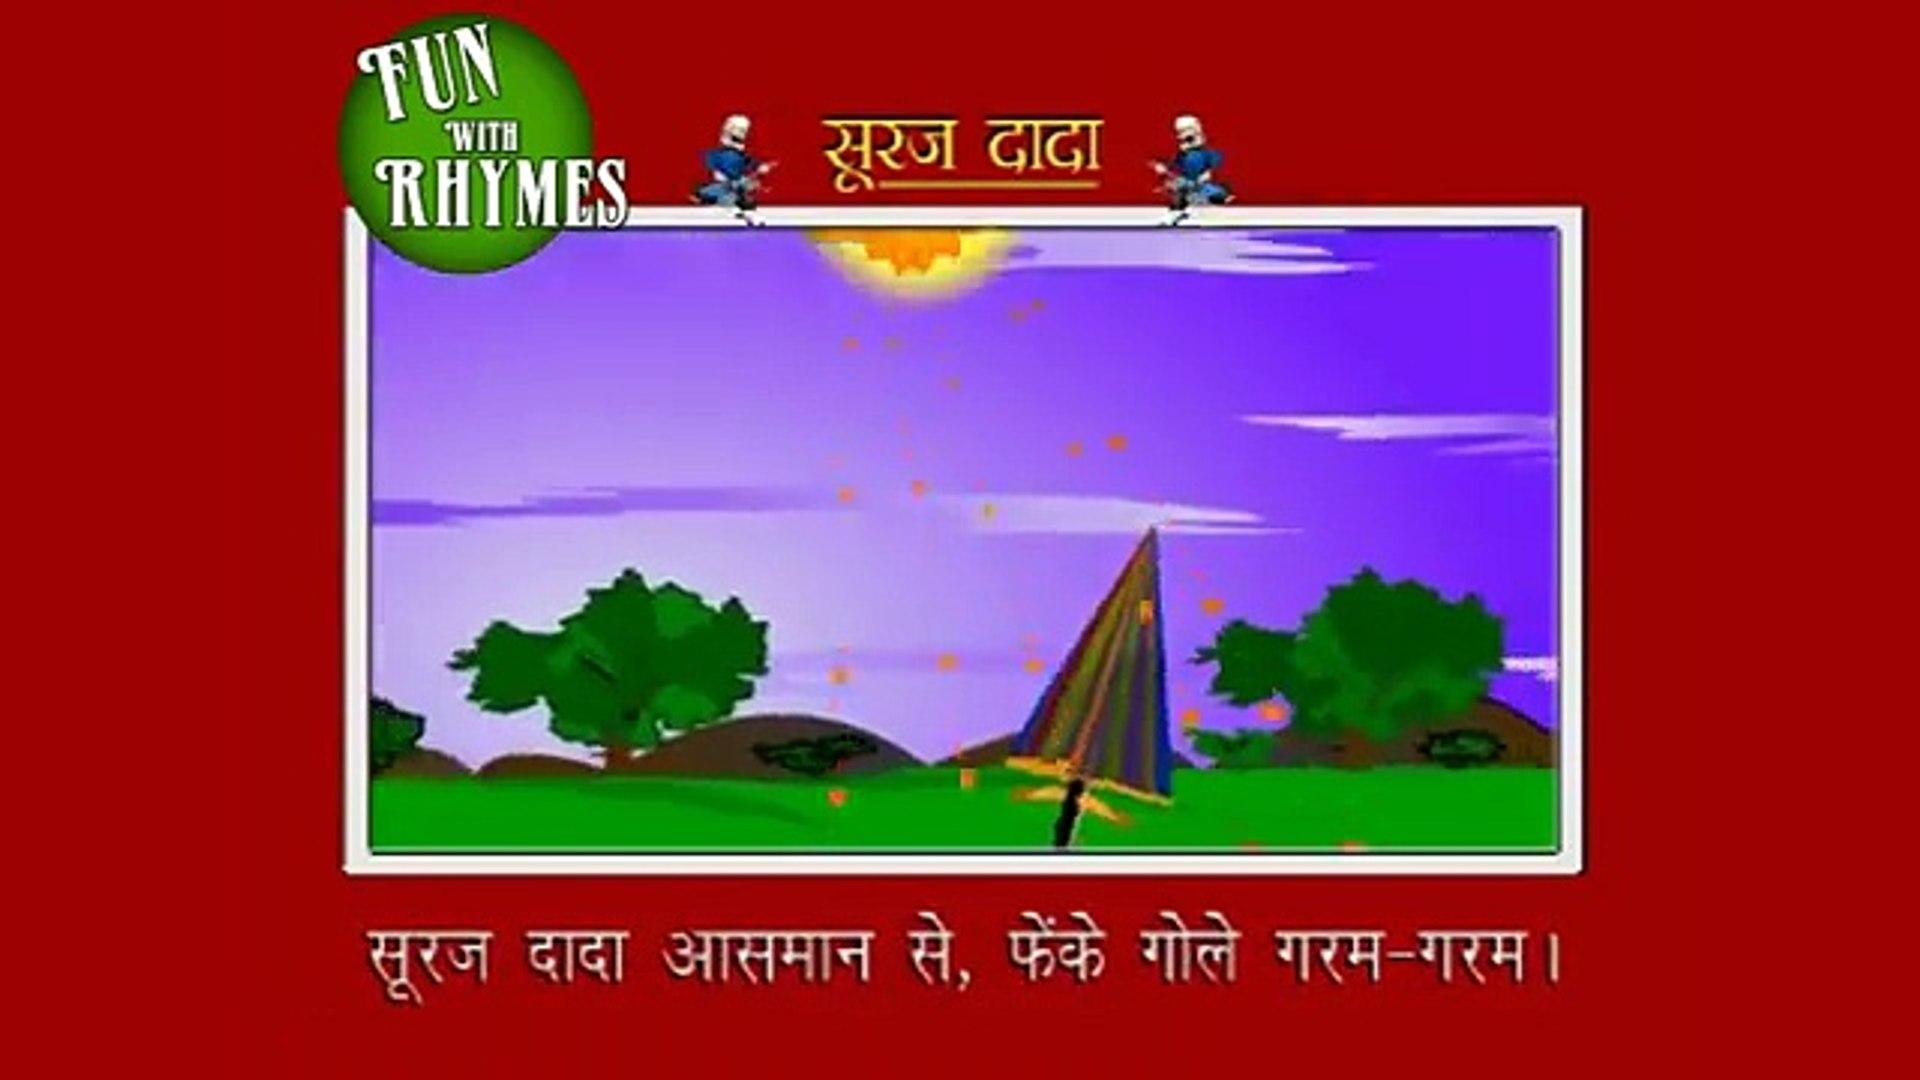 Learning New Rhymes - Suraj Dada - Kids Learning Made Fun